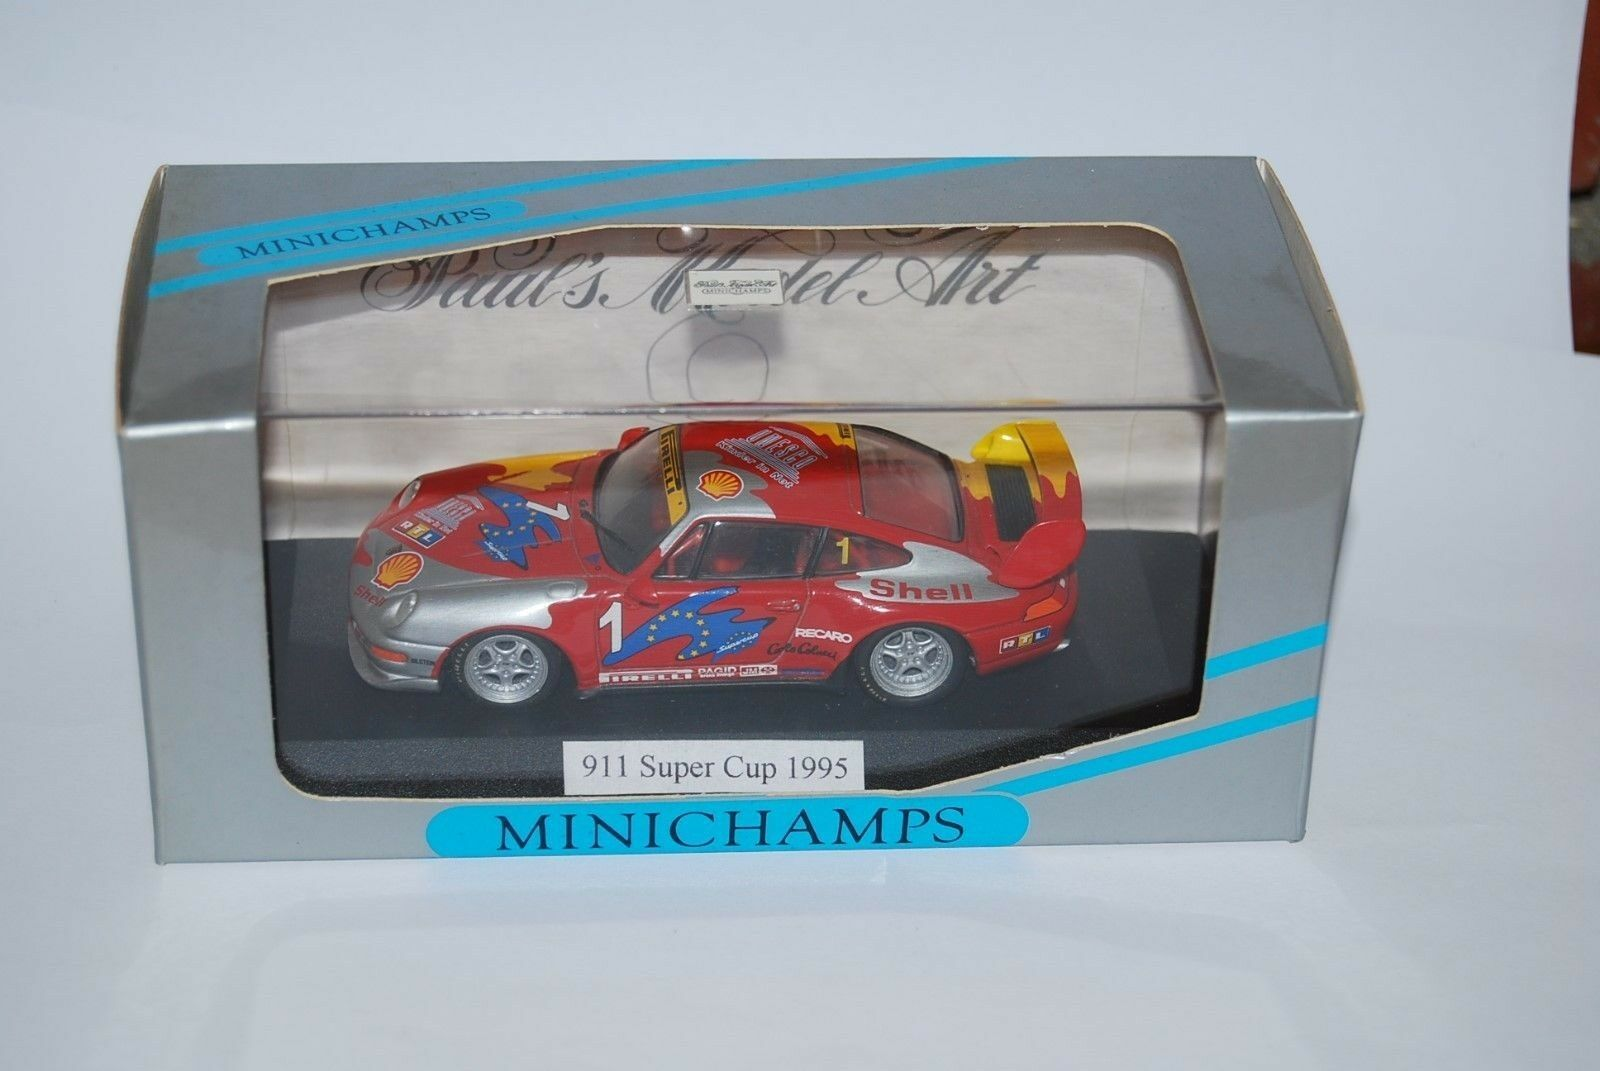 MINICHAMPS PORSCHE 911 SUPERCUP 1995 VIP CAR 430956501 NEUF BOITE NEW BOX 1 43